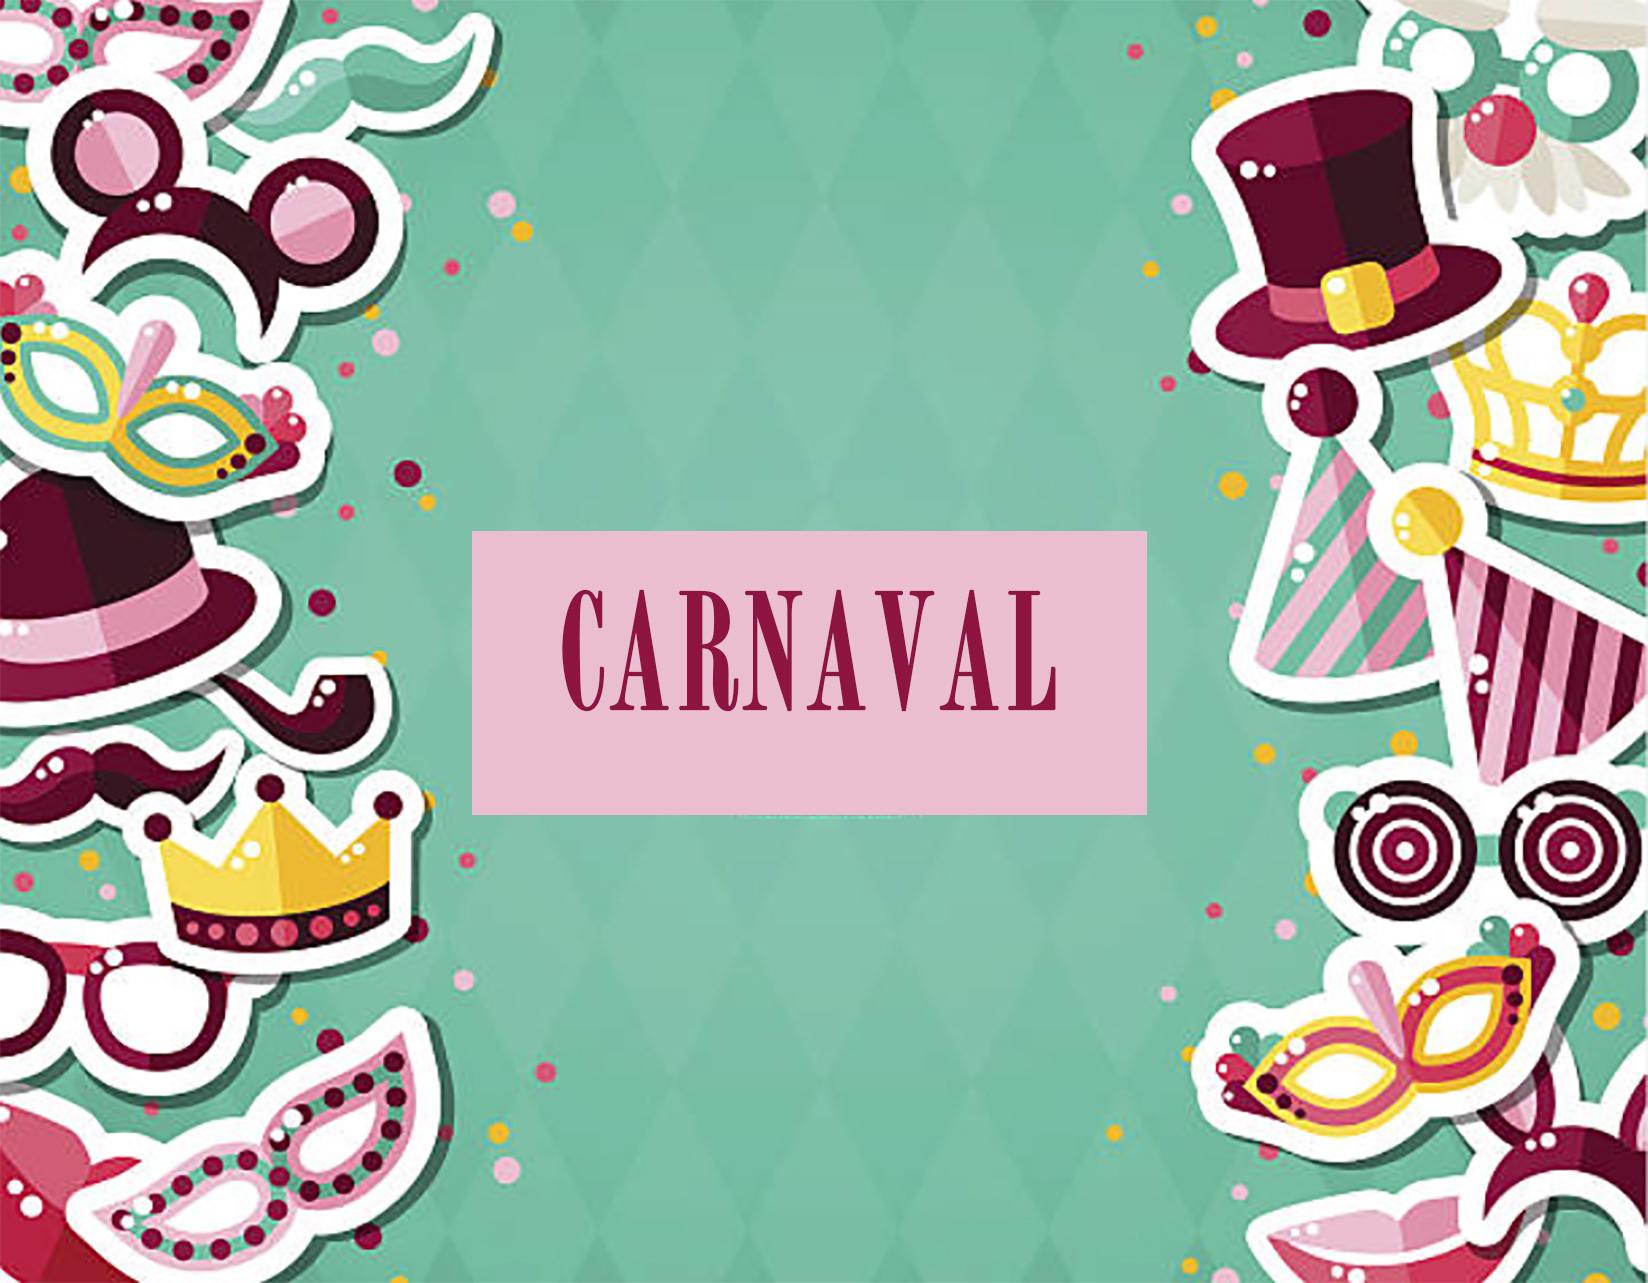 Samedi 24 mars c'est Carnaval